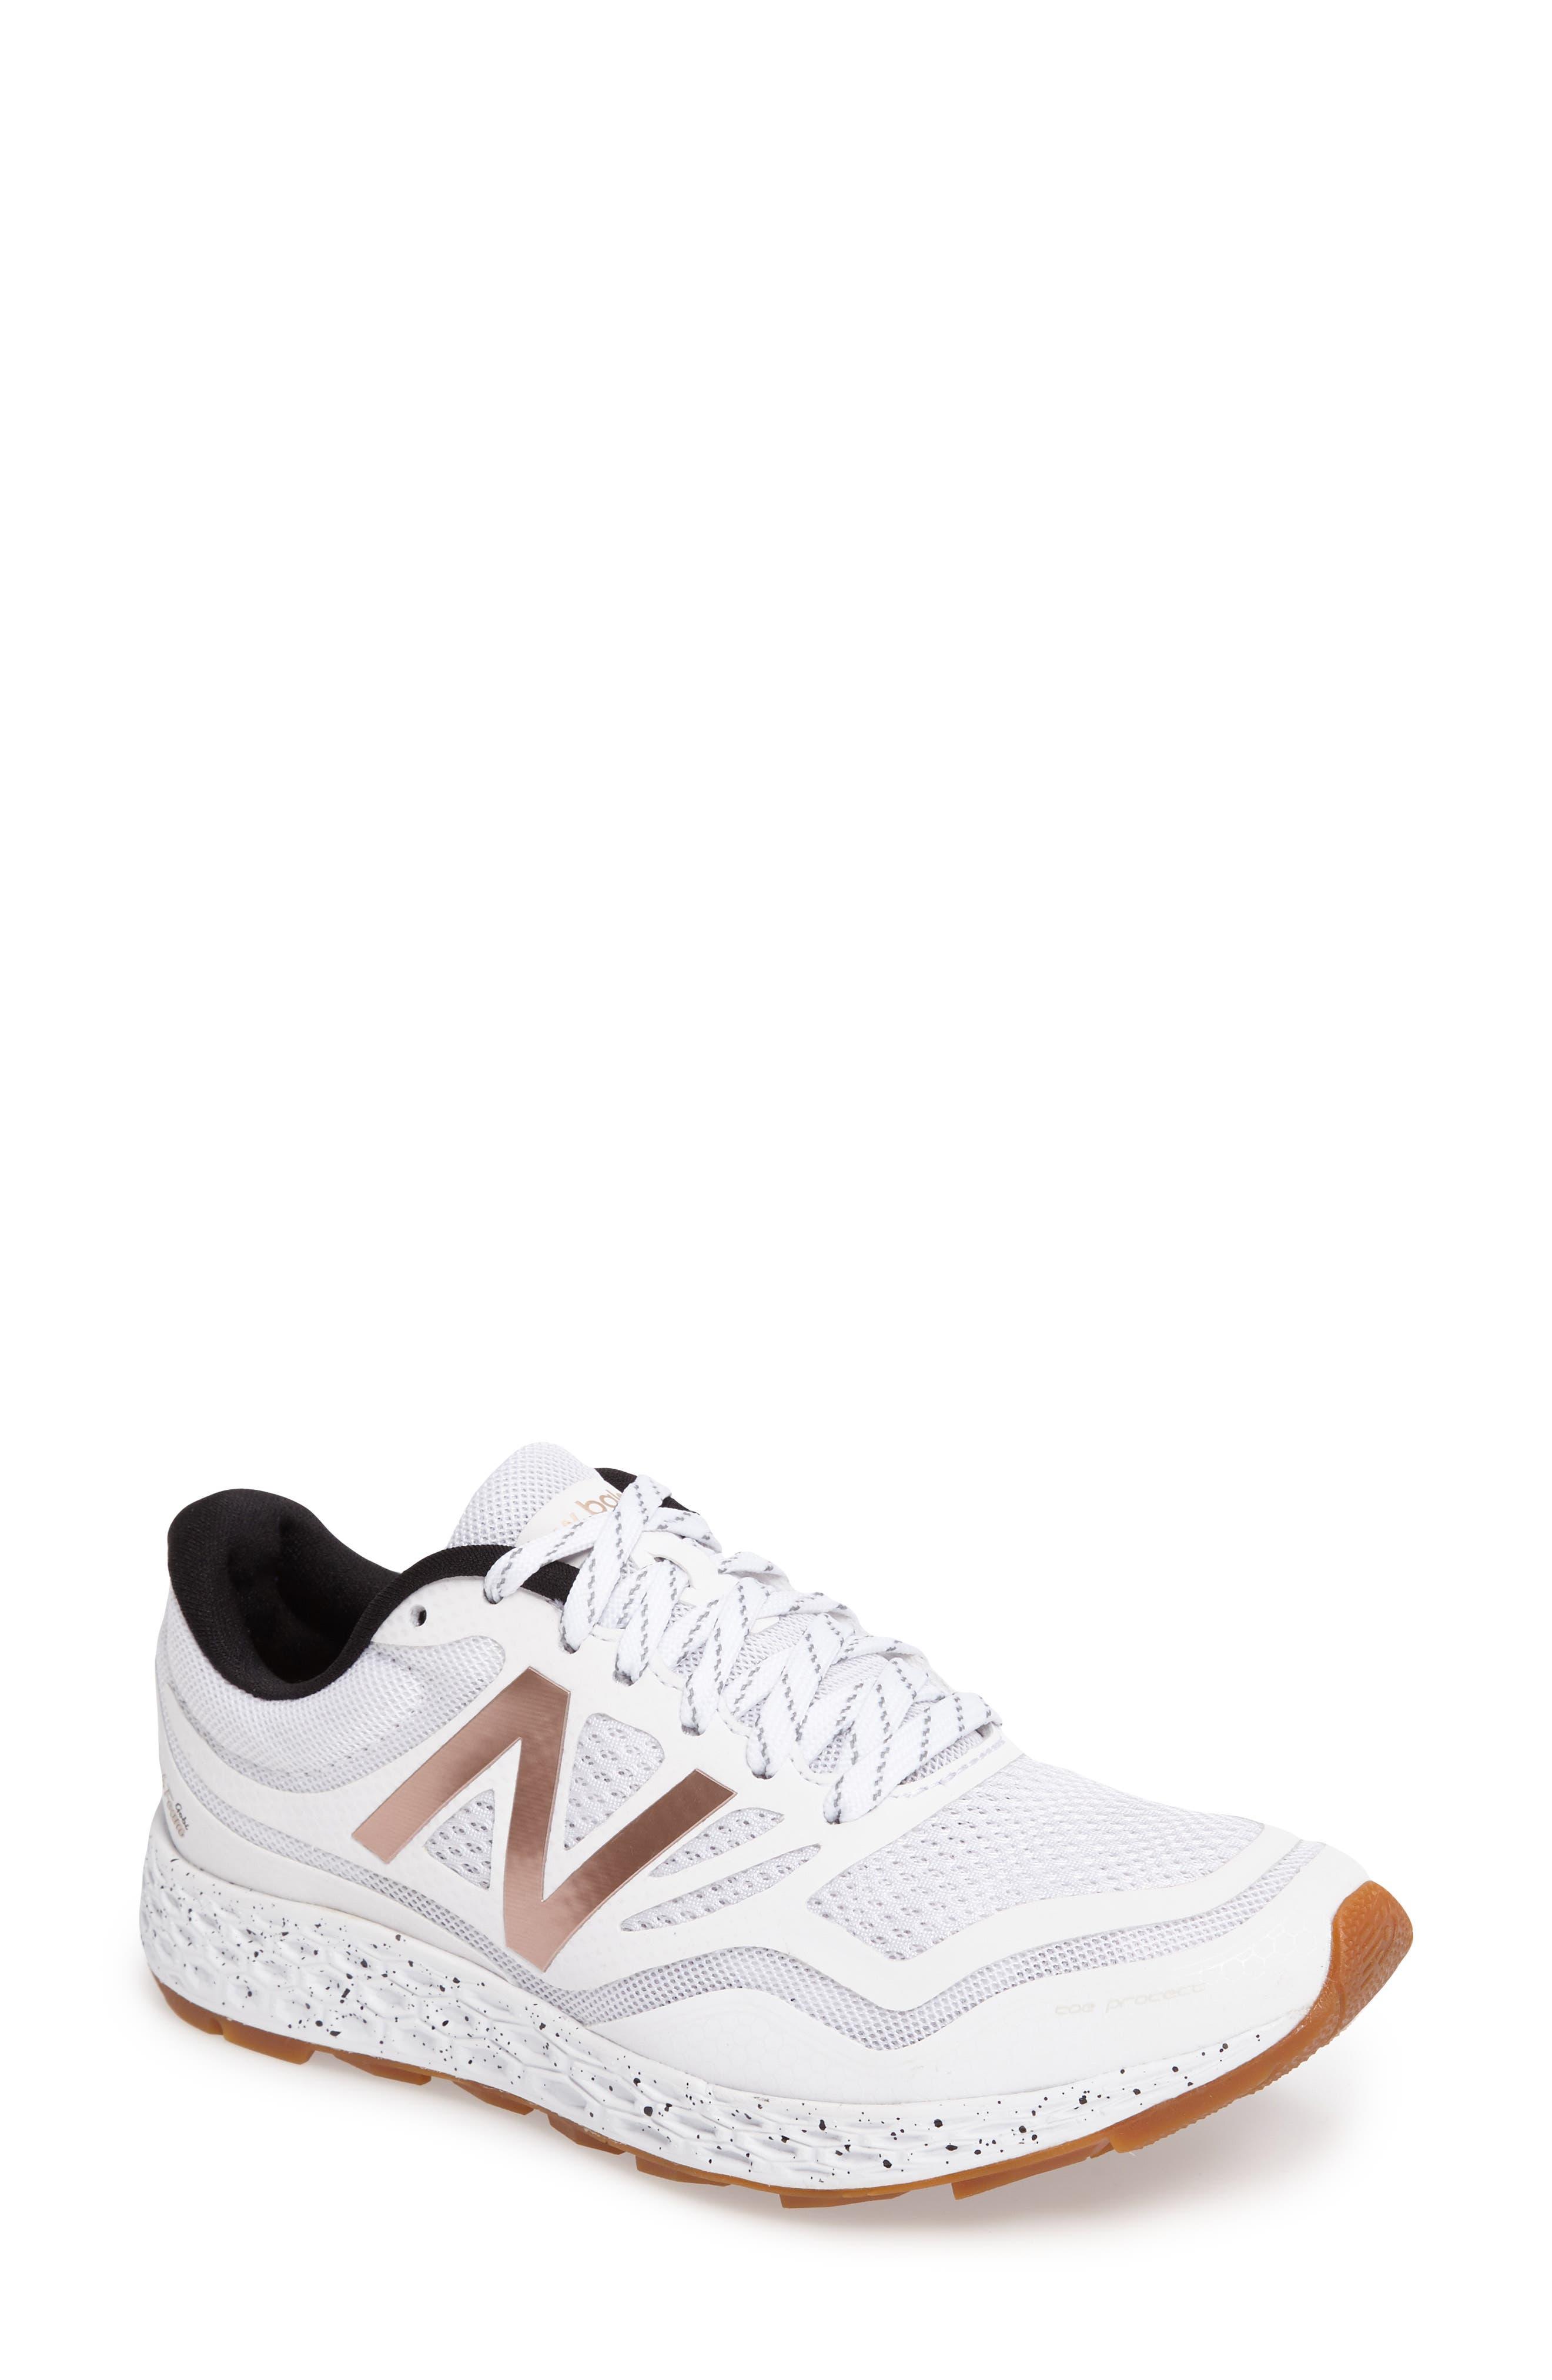 Main Image - New Balance Gobi Fresh Foam Trail Running Shoe (Women)